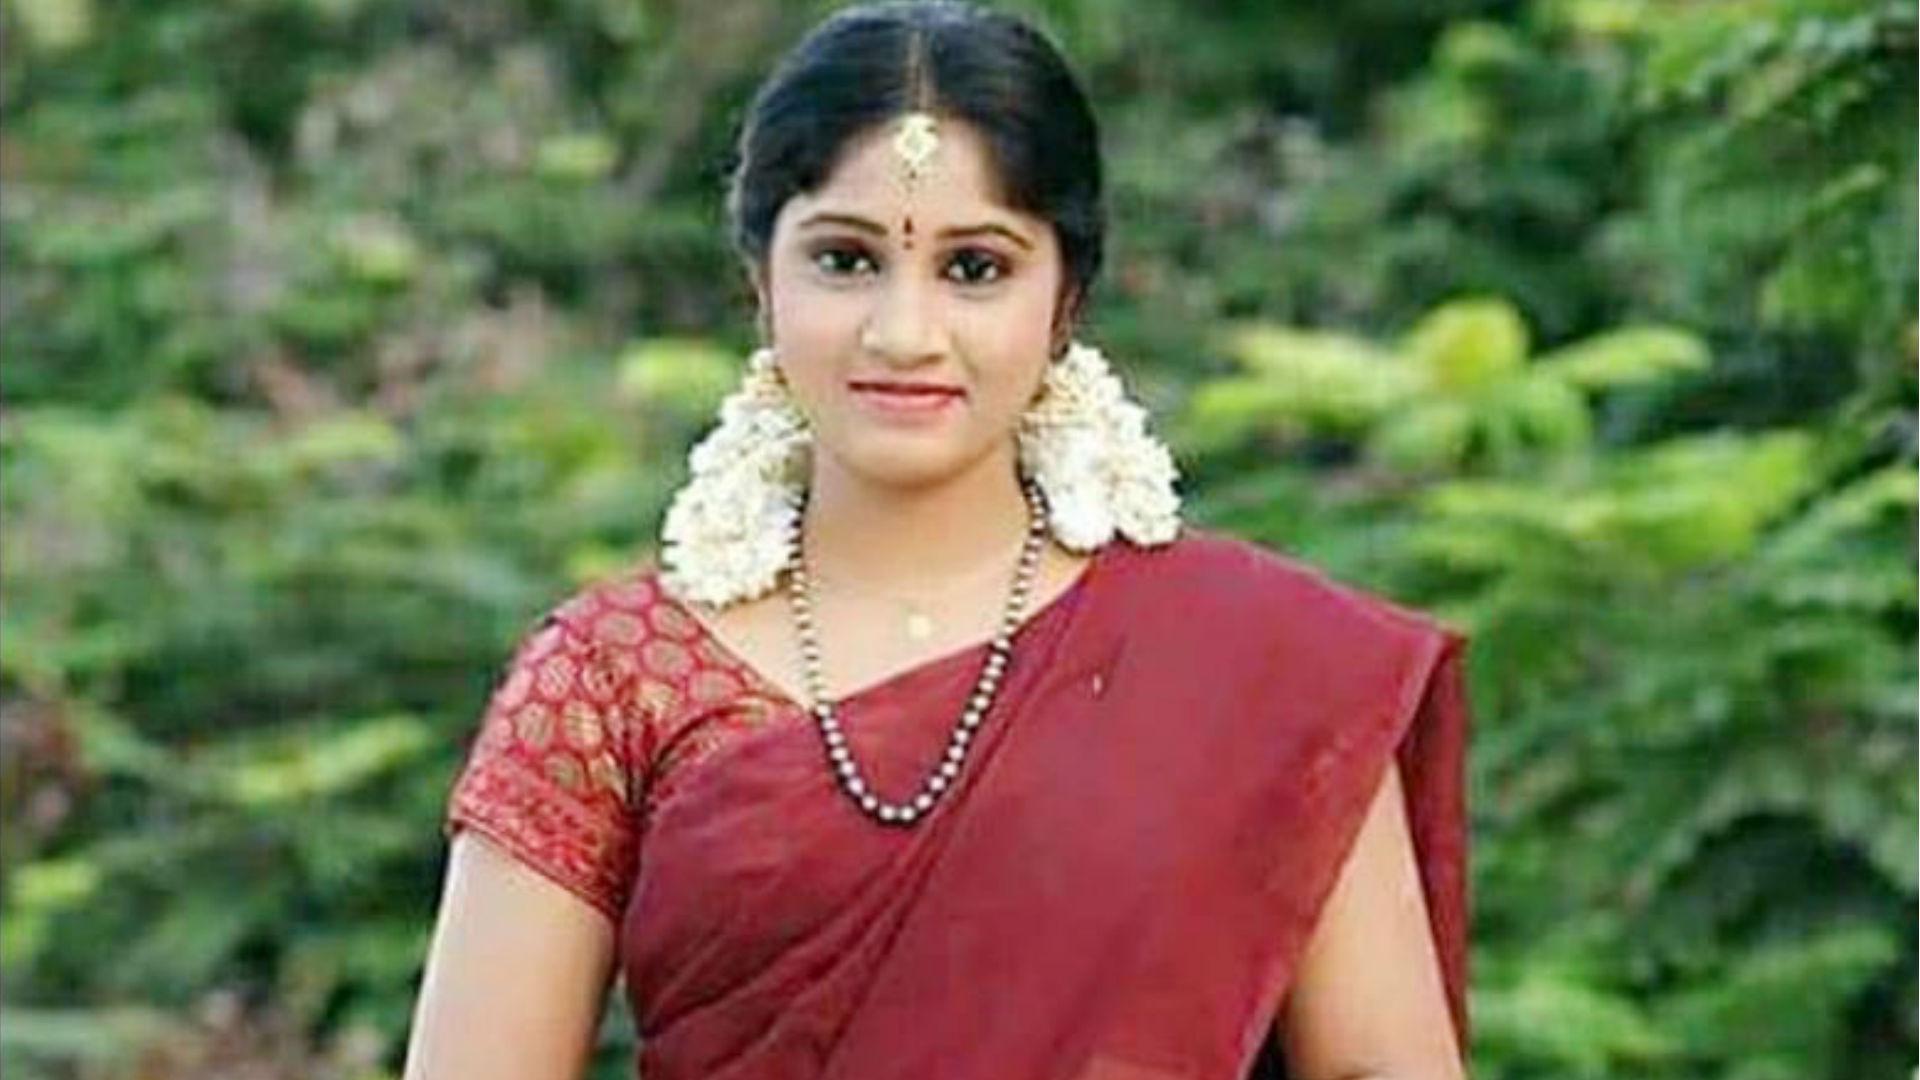 टीवी एक्ट्रेस नागा झांसी की खुदकुशी से उठे कई सवाल, तेलुगू फिल्म इंडस्ट्री को लगी किसकी नजर?